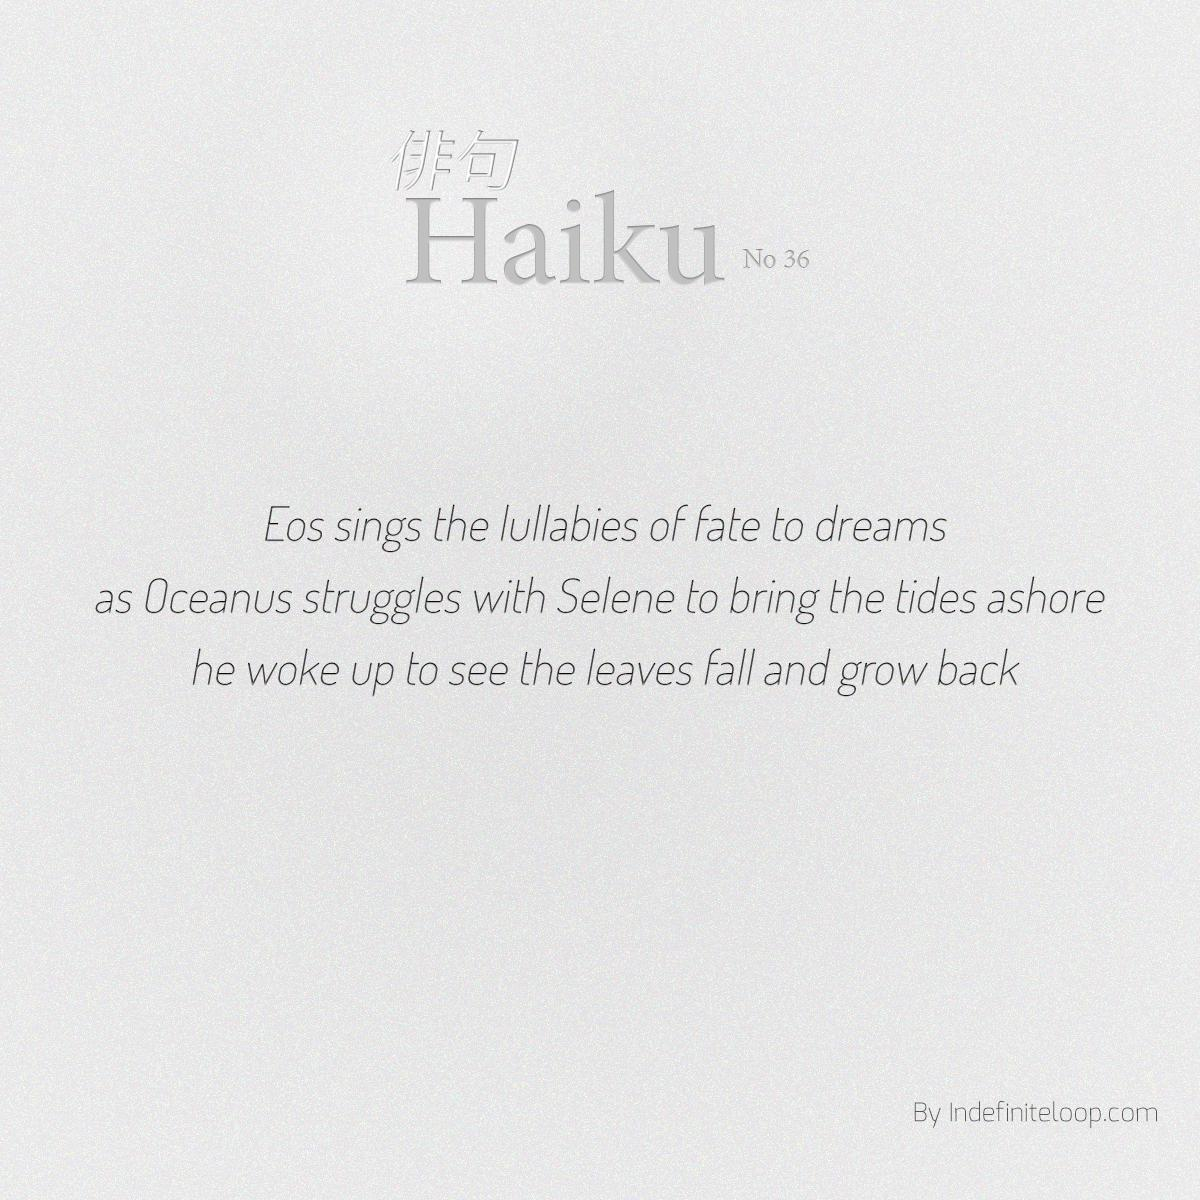 indefiniteloop.com - Haiku No. 36 - Ikigai.